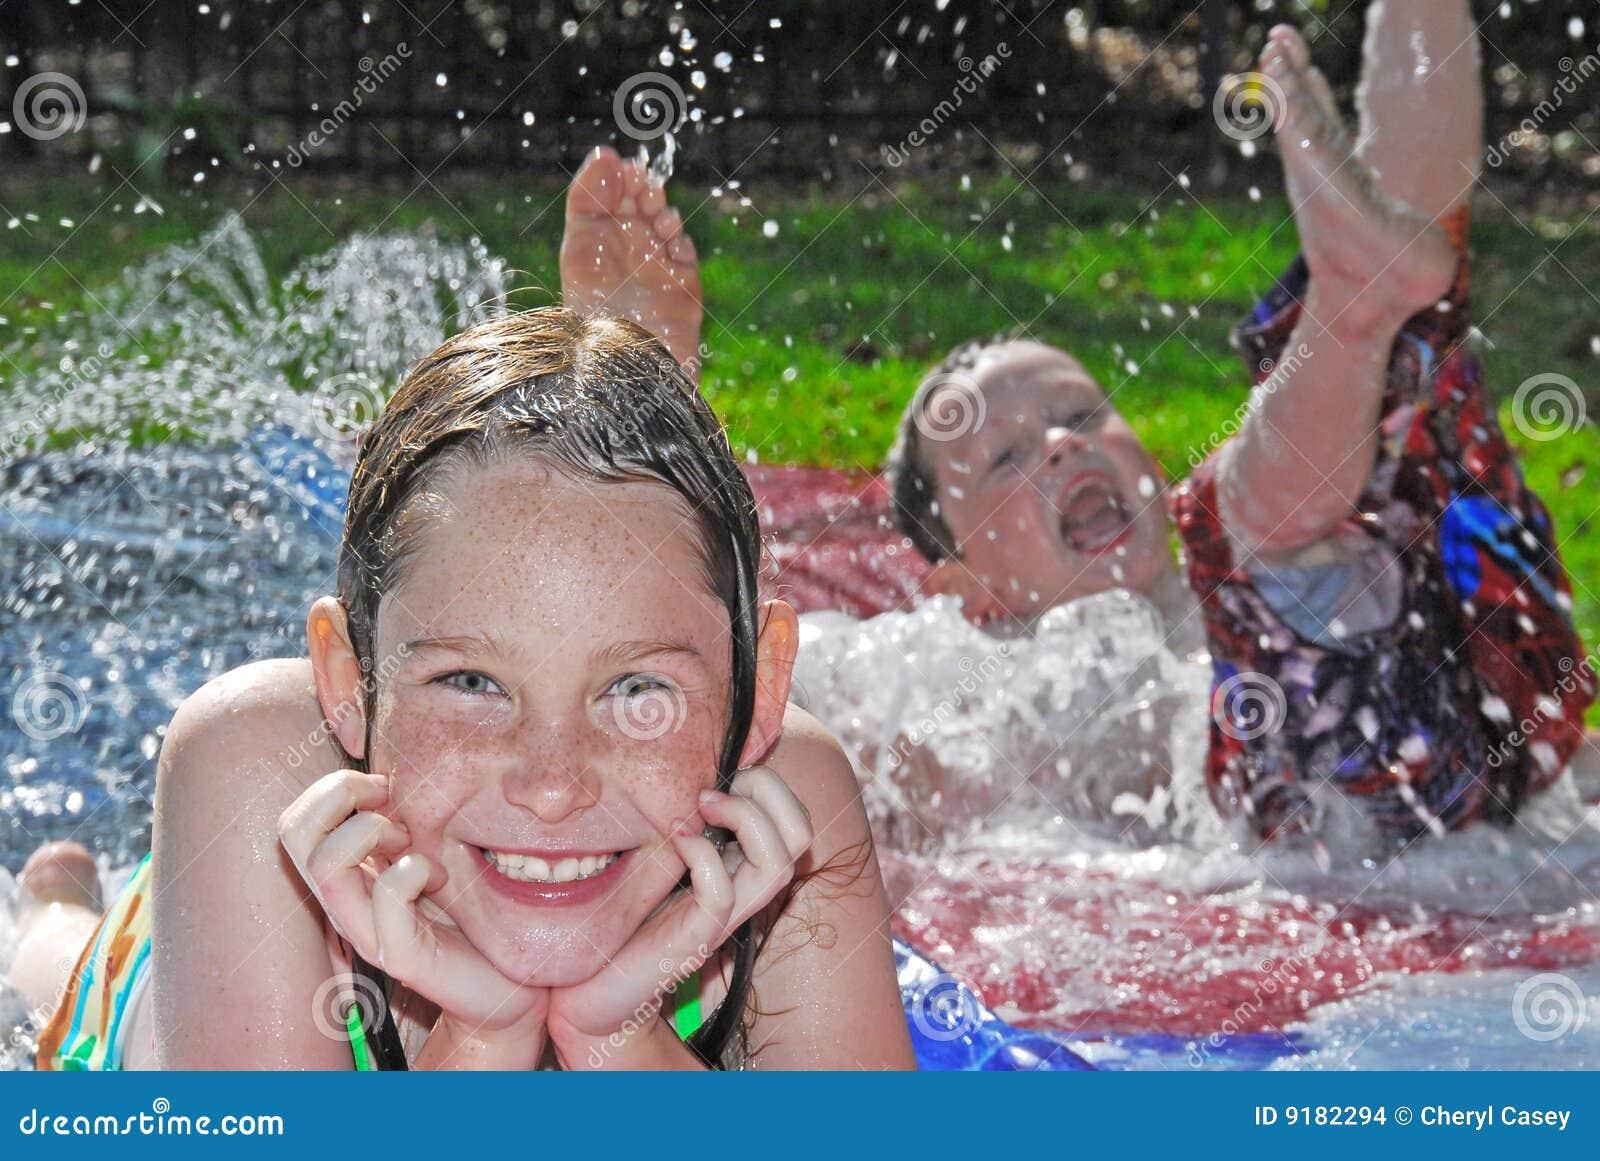 Outside Kid Water Games